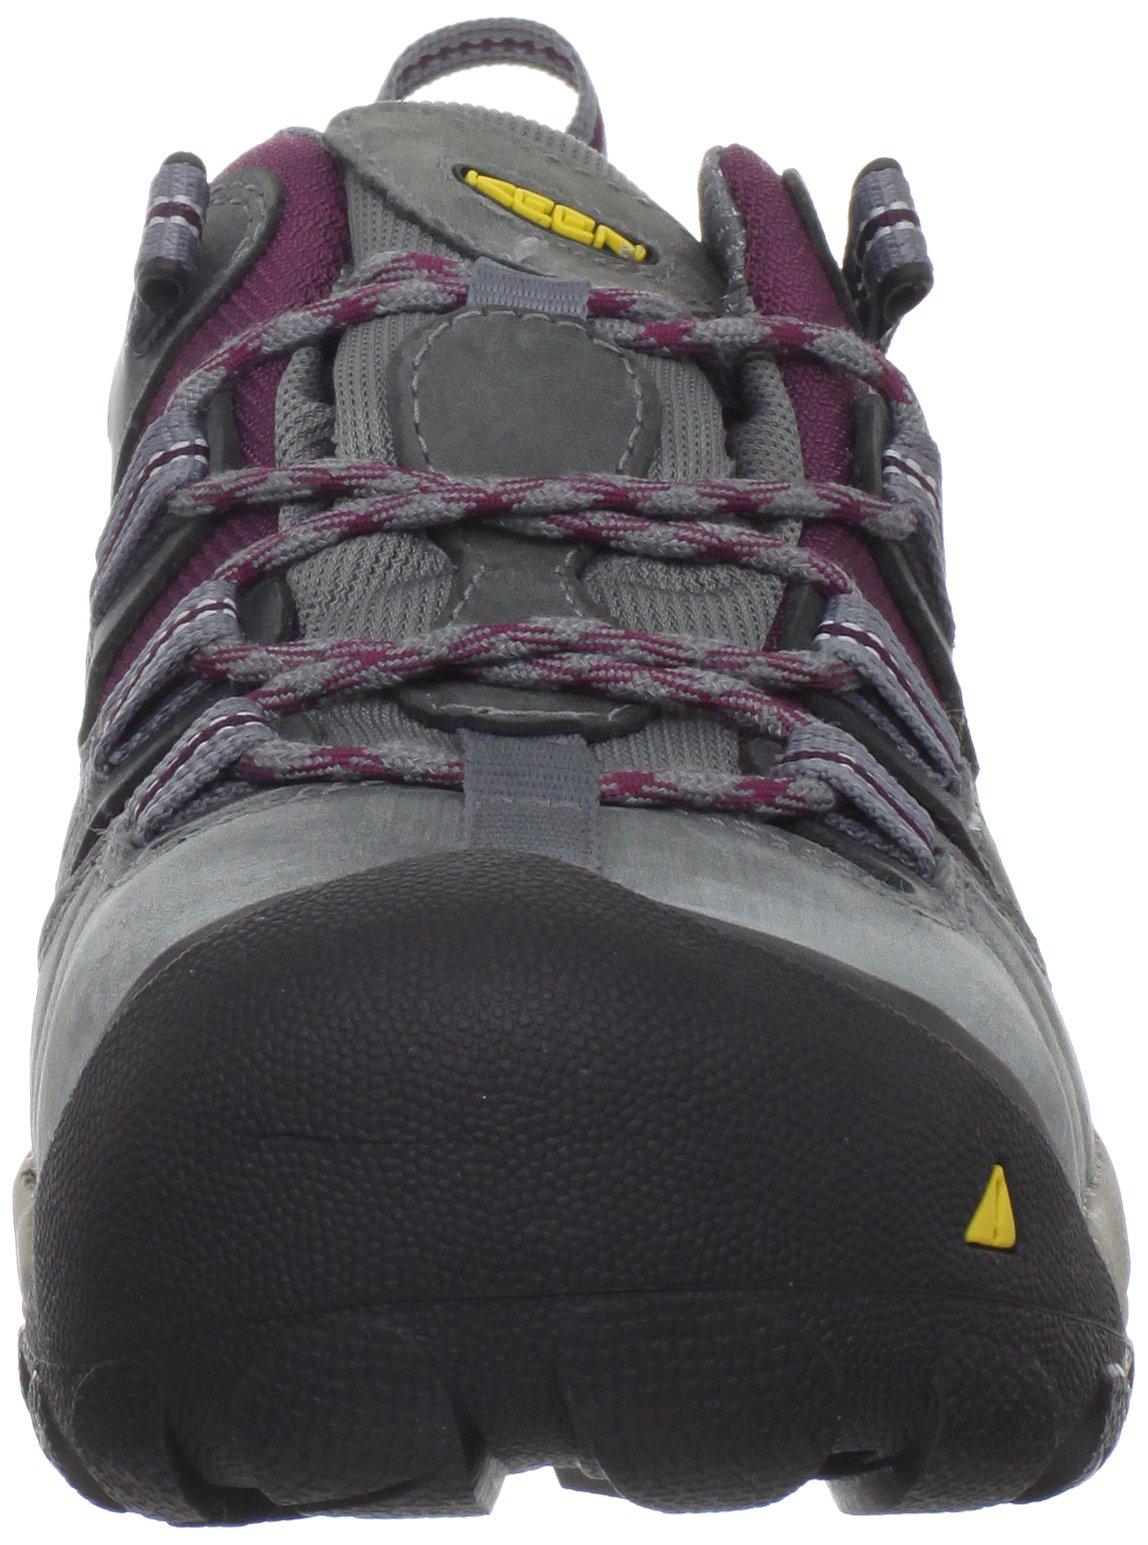 b593a7865d KEEN Utility Women s Detroit Low Steel Toe Work Shoe - 1007016   Industrial    Construction   Clothing